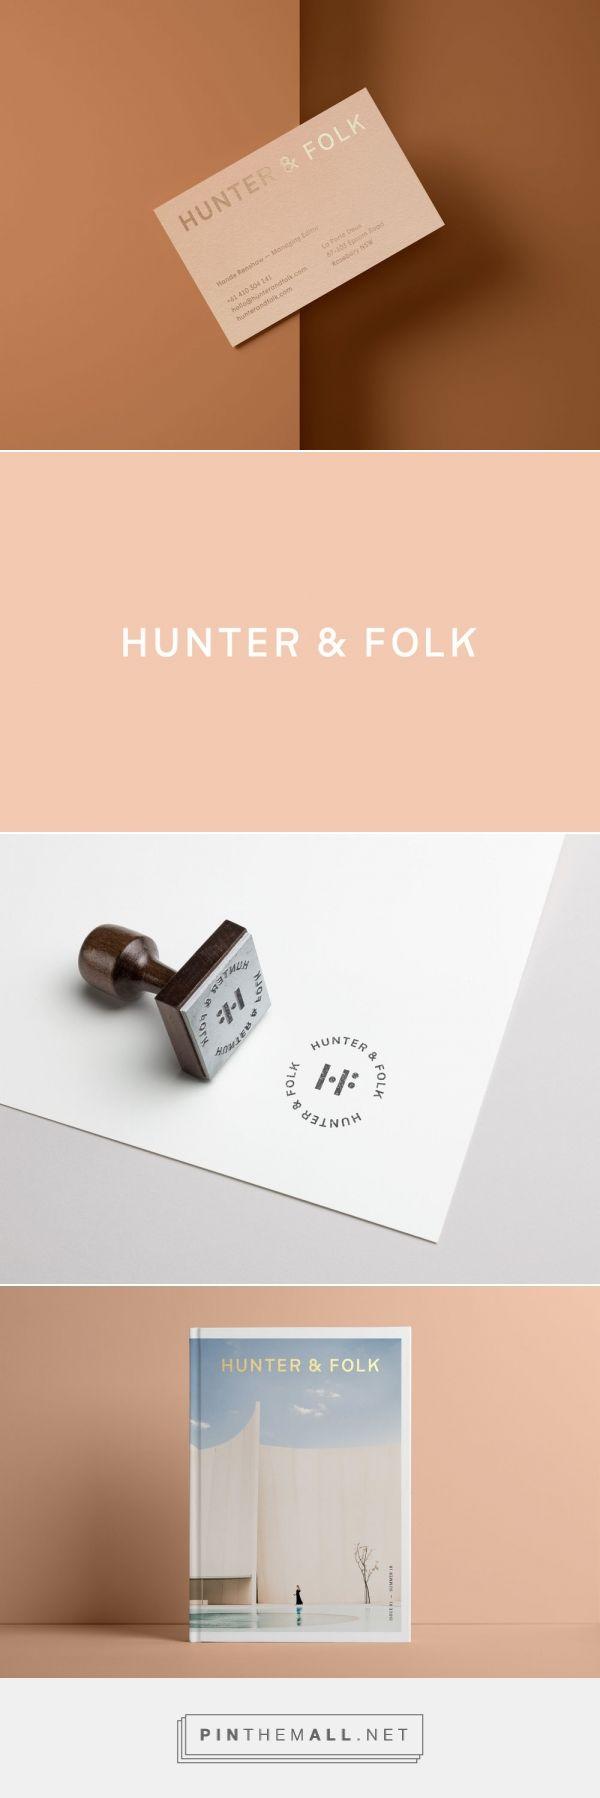 Hunter & Folk business card & website design— Cristie Stevens Cartes de visite – Inspiration cartes de visite design et originales